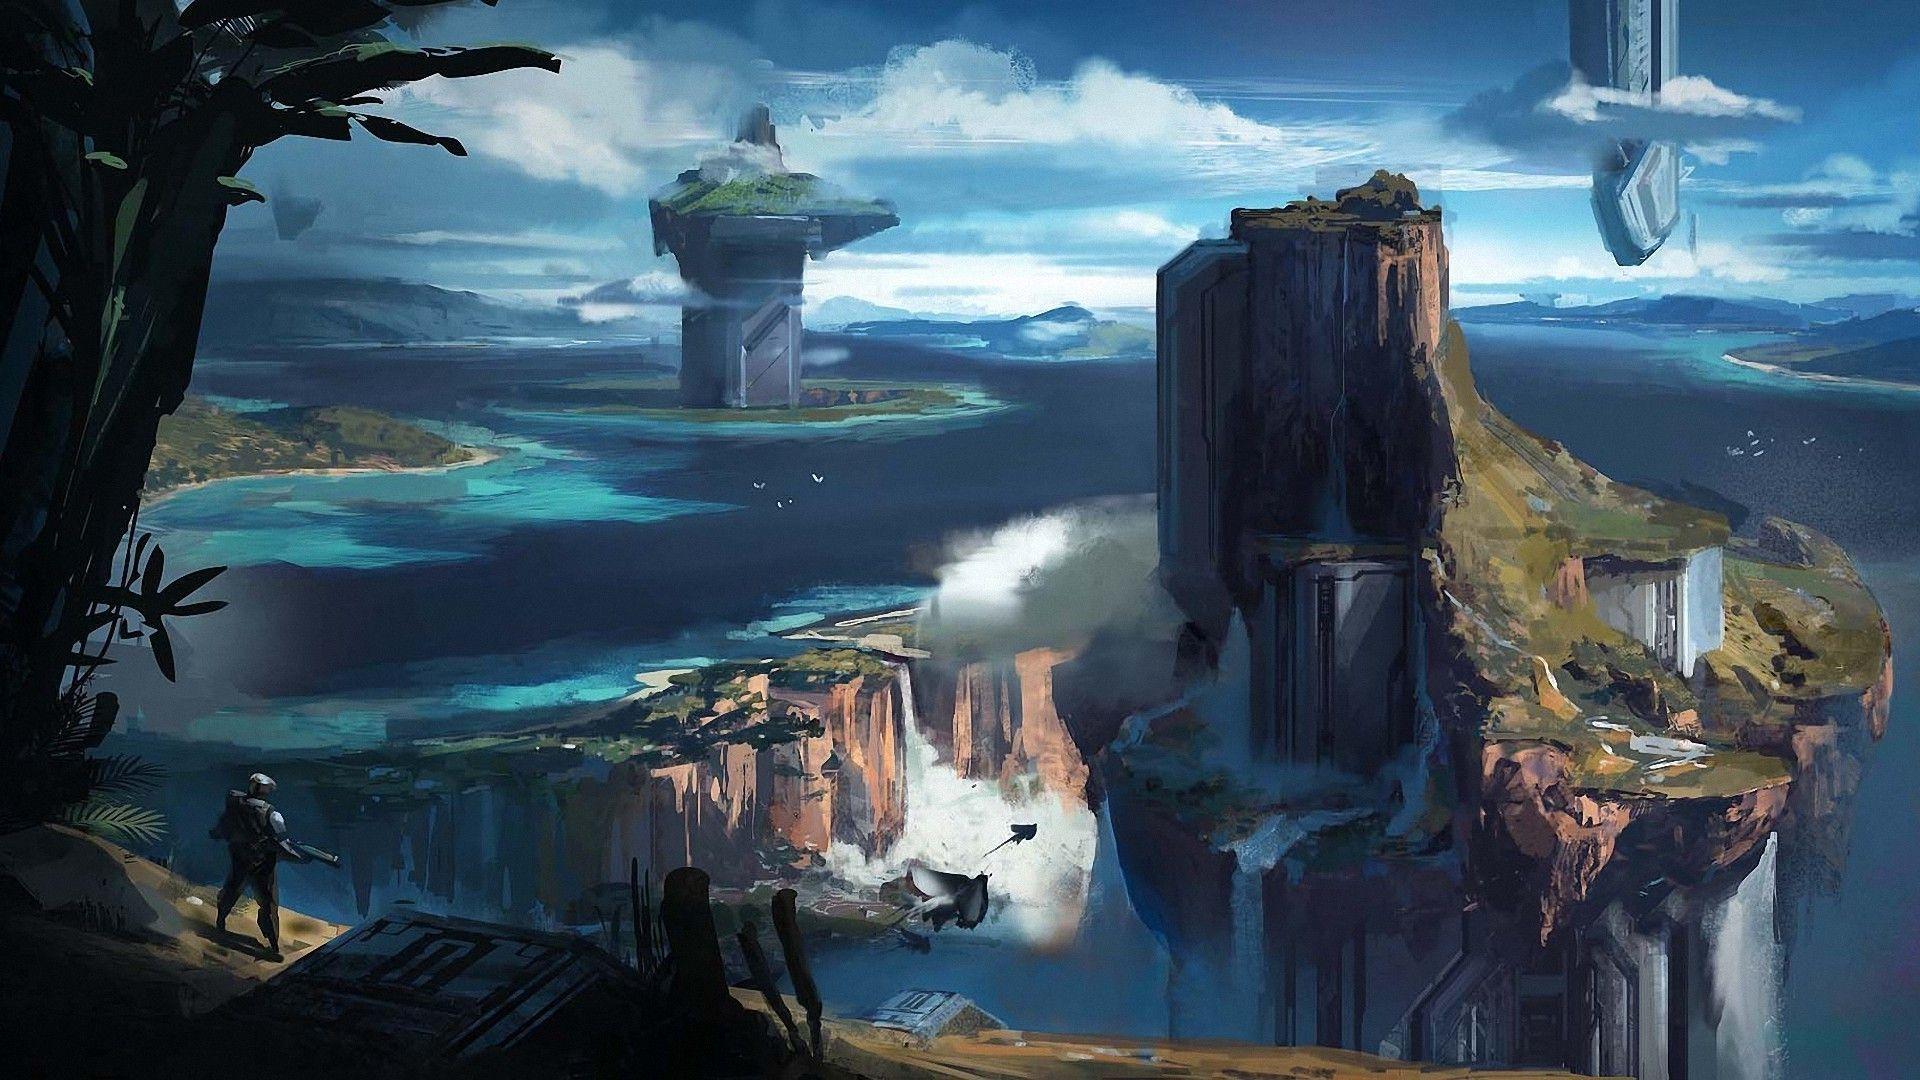 Sci Fi Sci Fi Wallpaper Sci Fi Fantasy Island